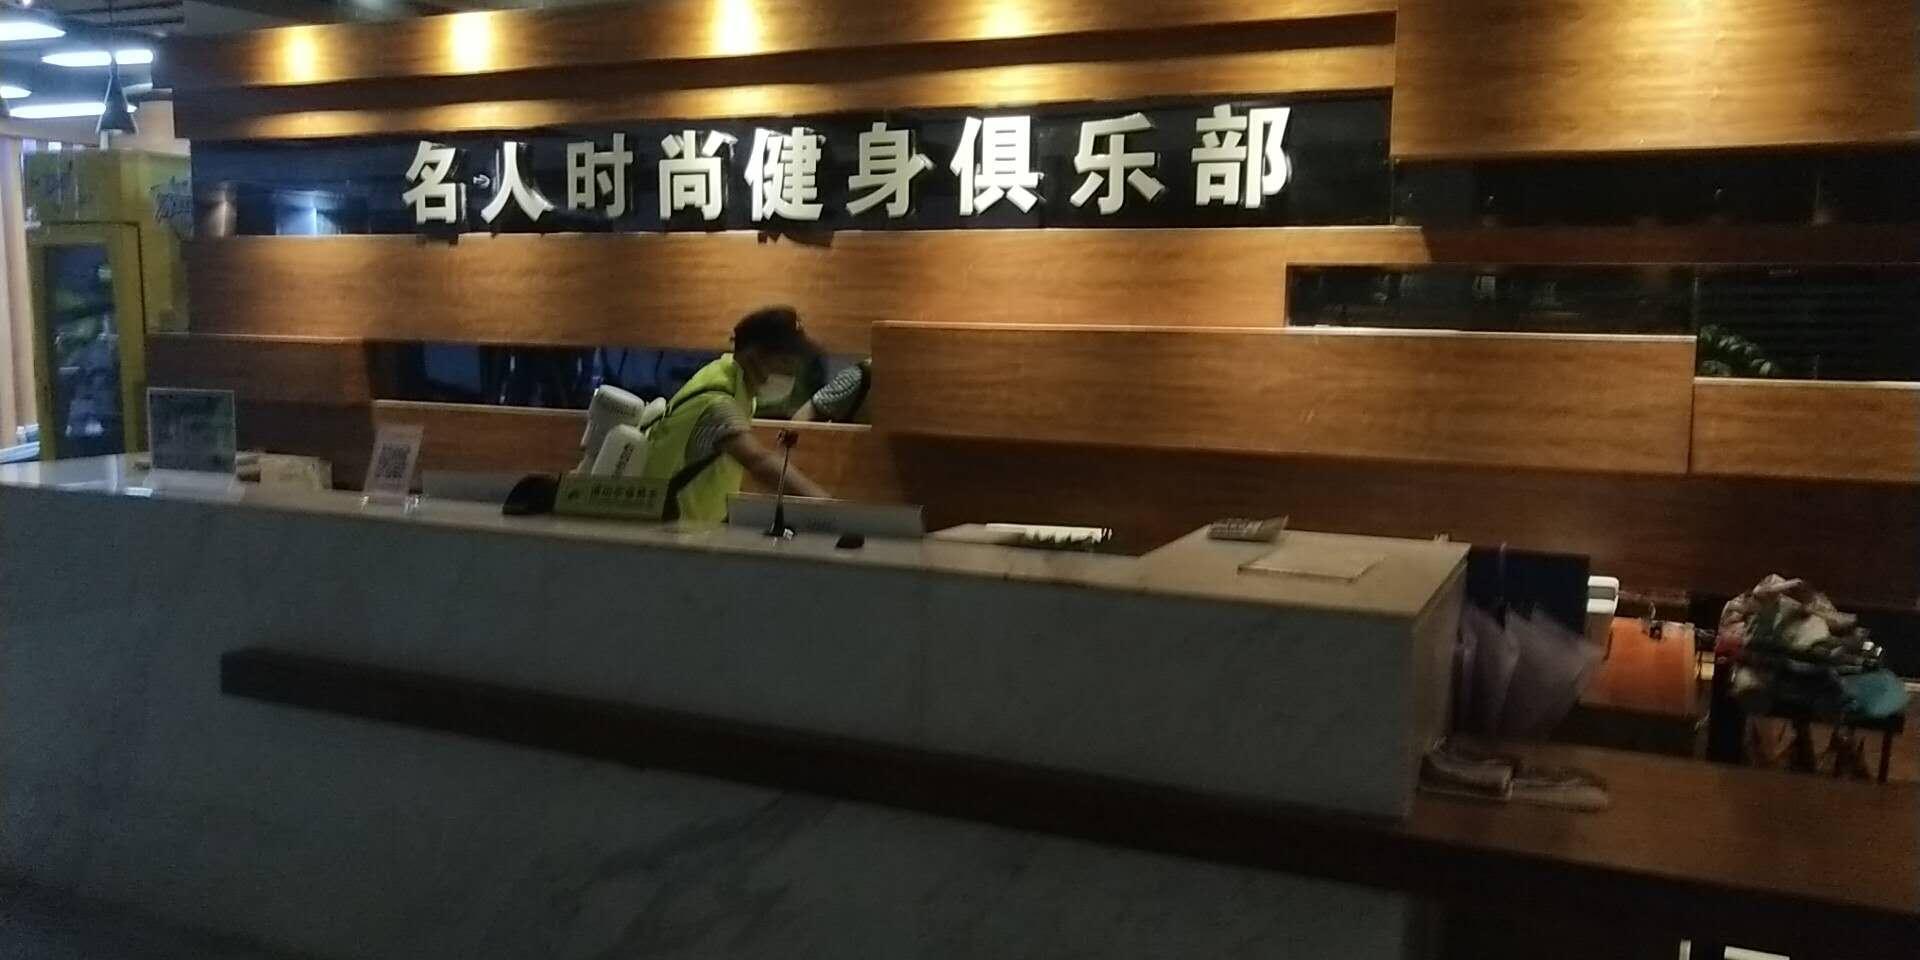 title='清城区新城名人时尚'